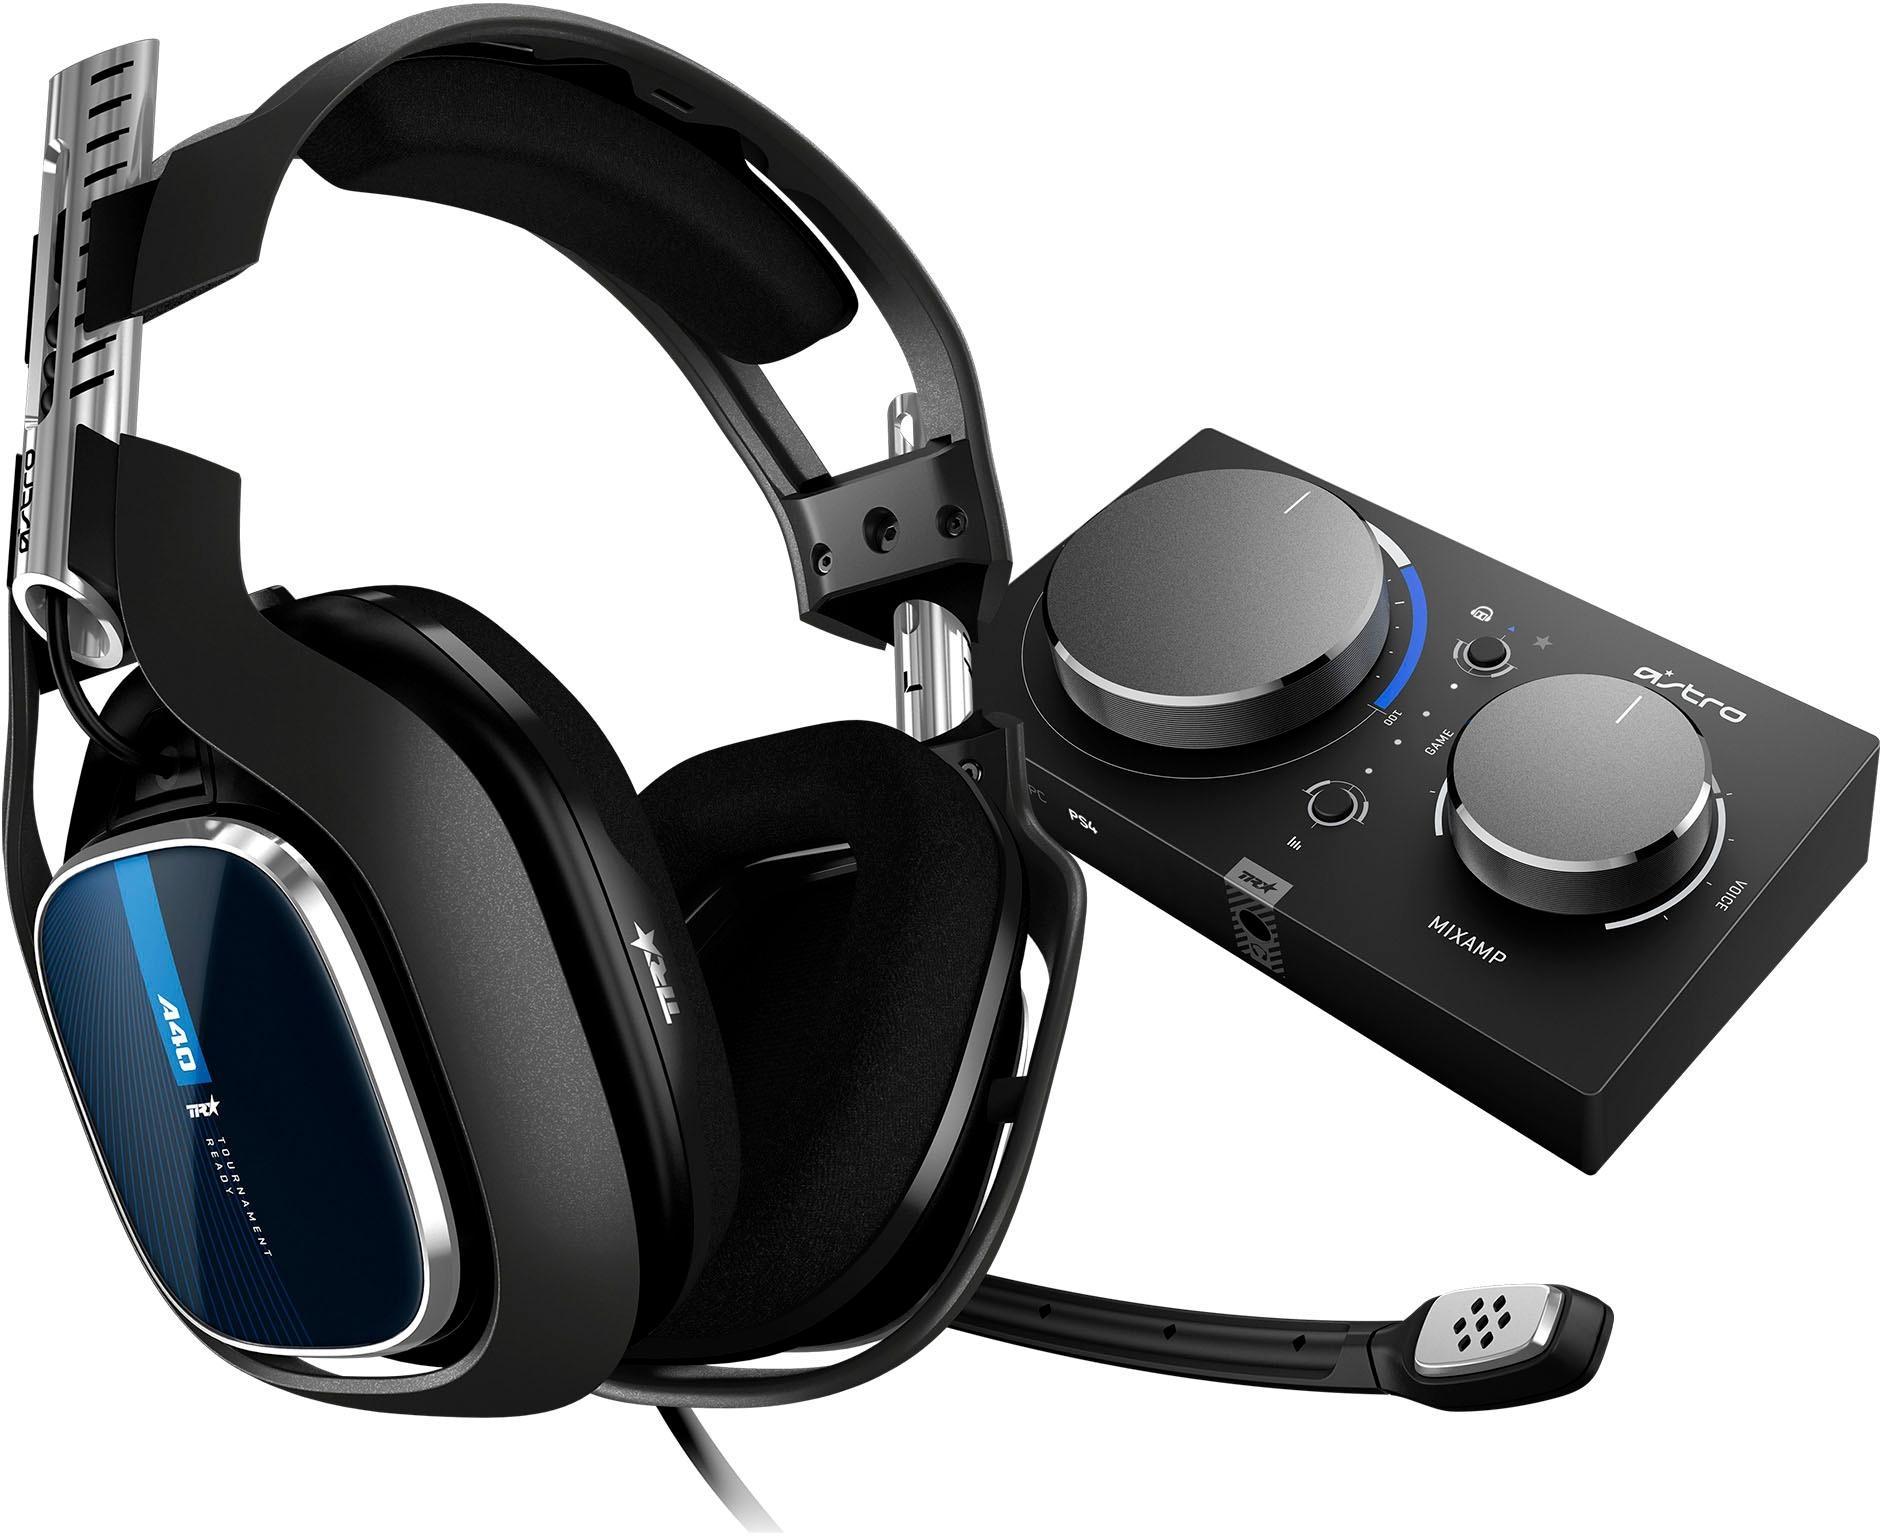 Image of ASTRO »A40 TR Headset + MixAmp Pro TR -NEU- (PS4, PS3, PC, MAC)« Gaming-Headset (kabelgebunden, Rauschunterdrückung, außenstehendes Mikrofon)